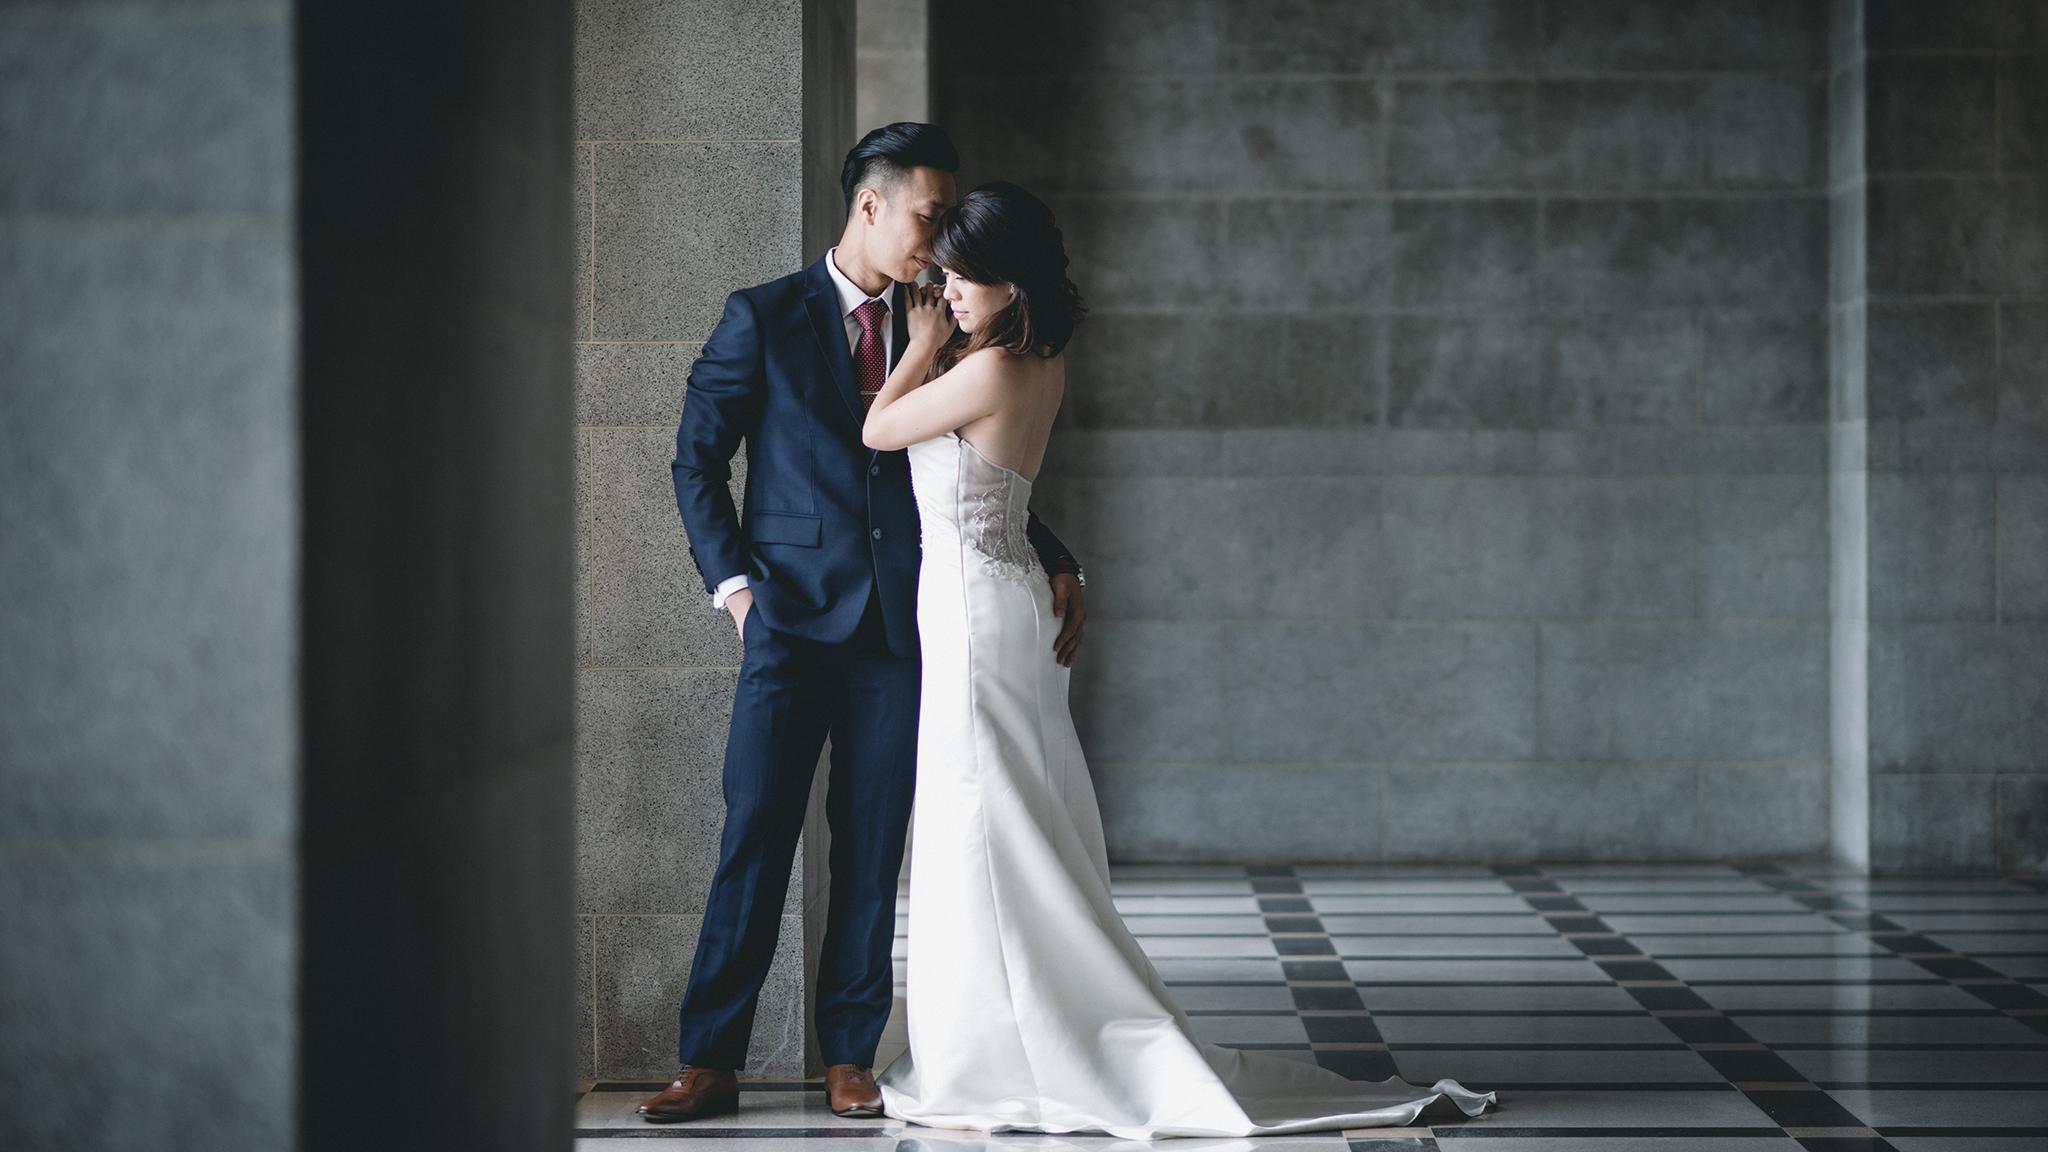 Wedding National Gallery 21.JPG